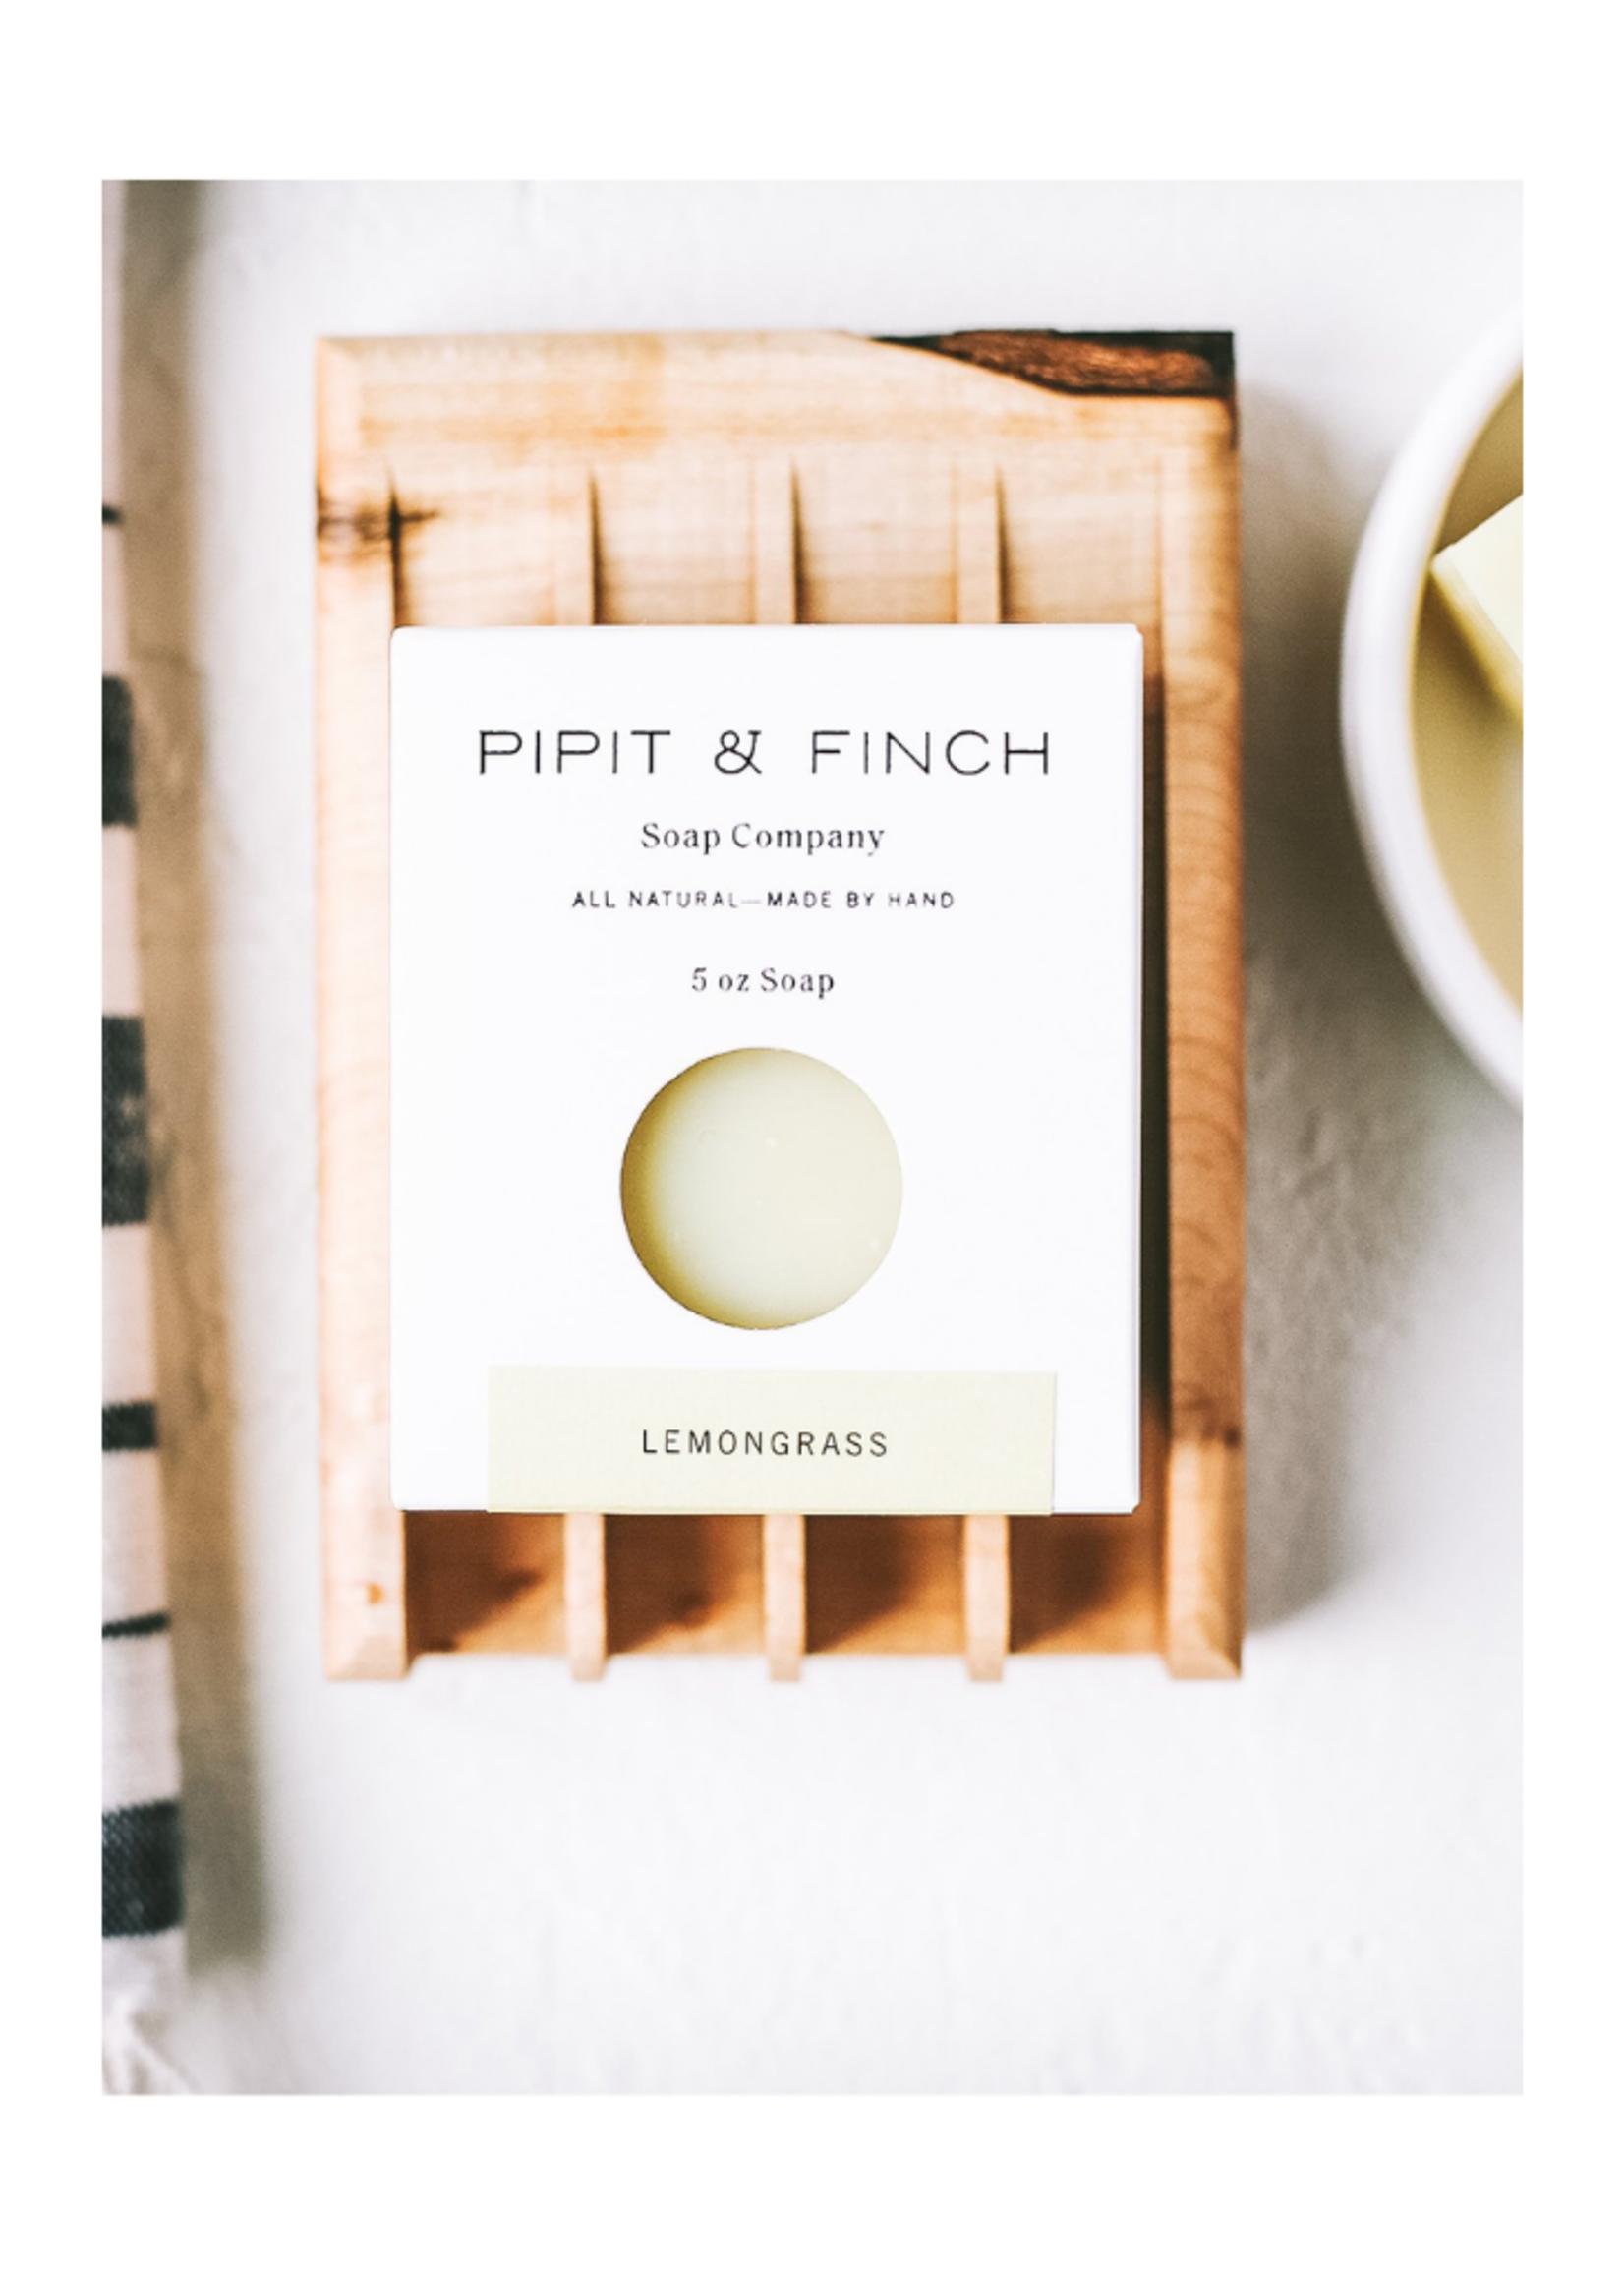 Pipit & Finch Pipit & Finch Lemongrass Soap Bar